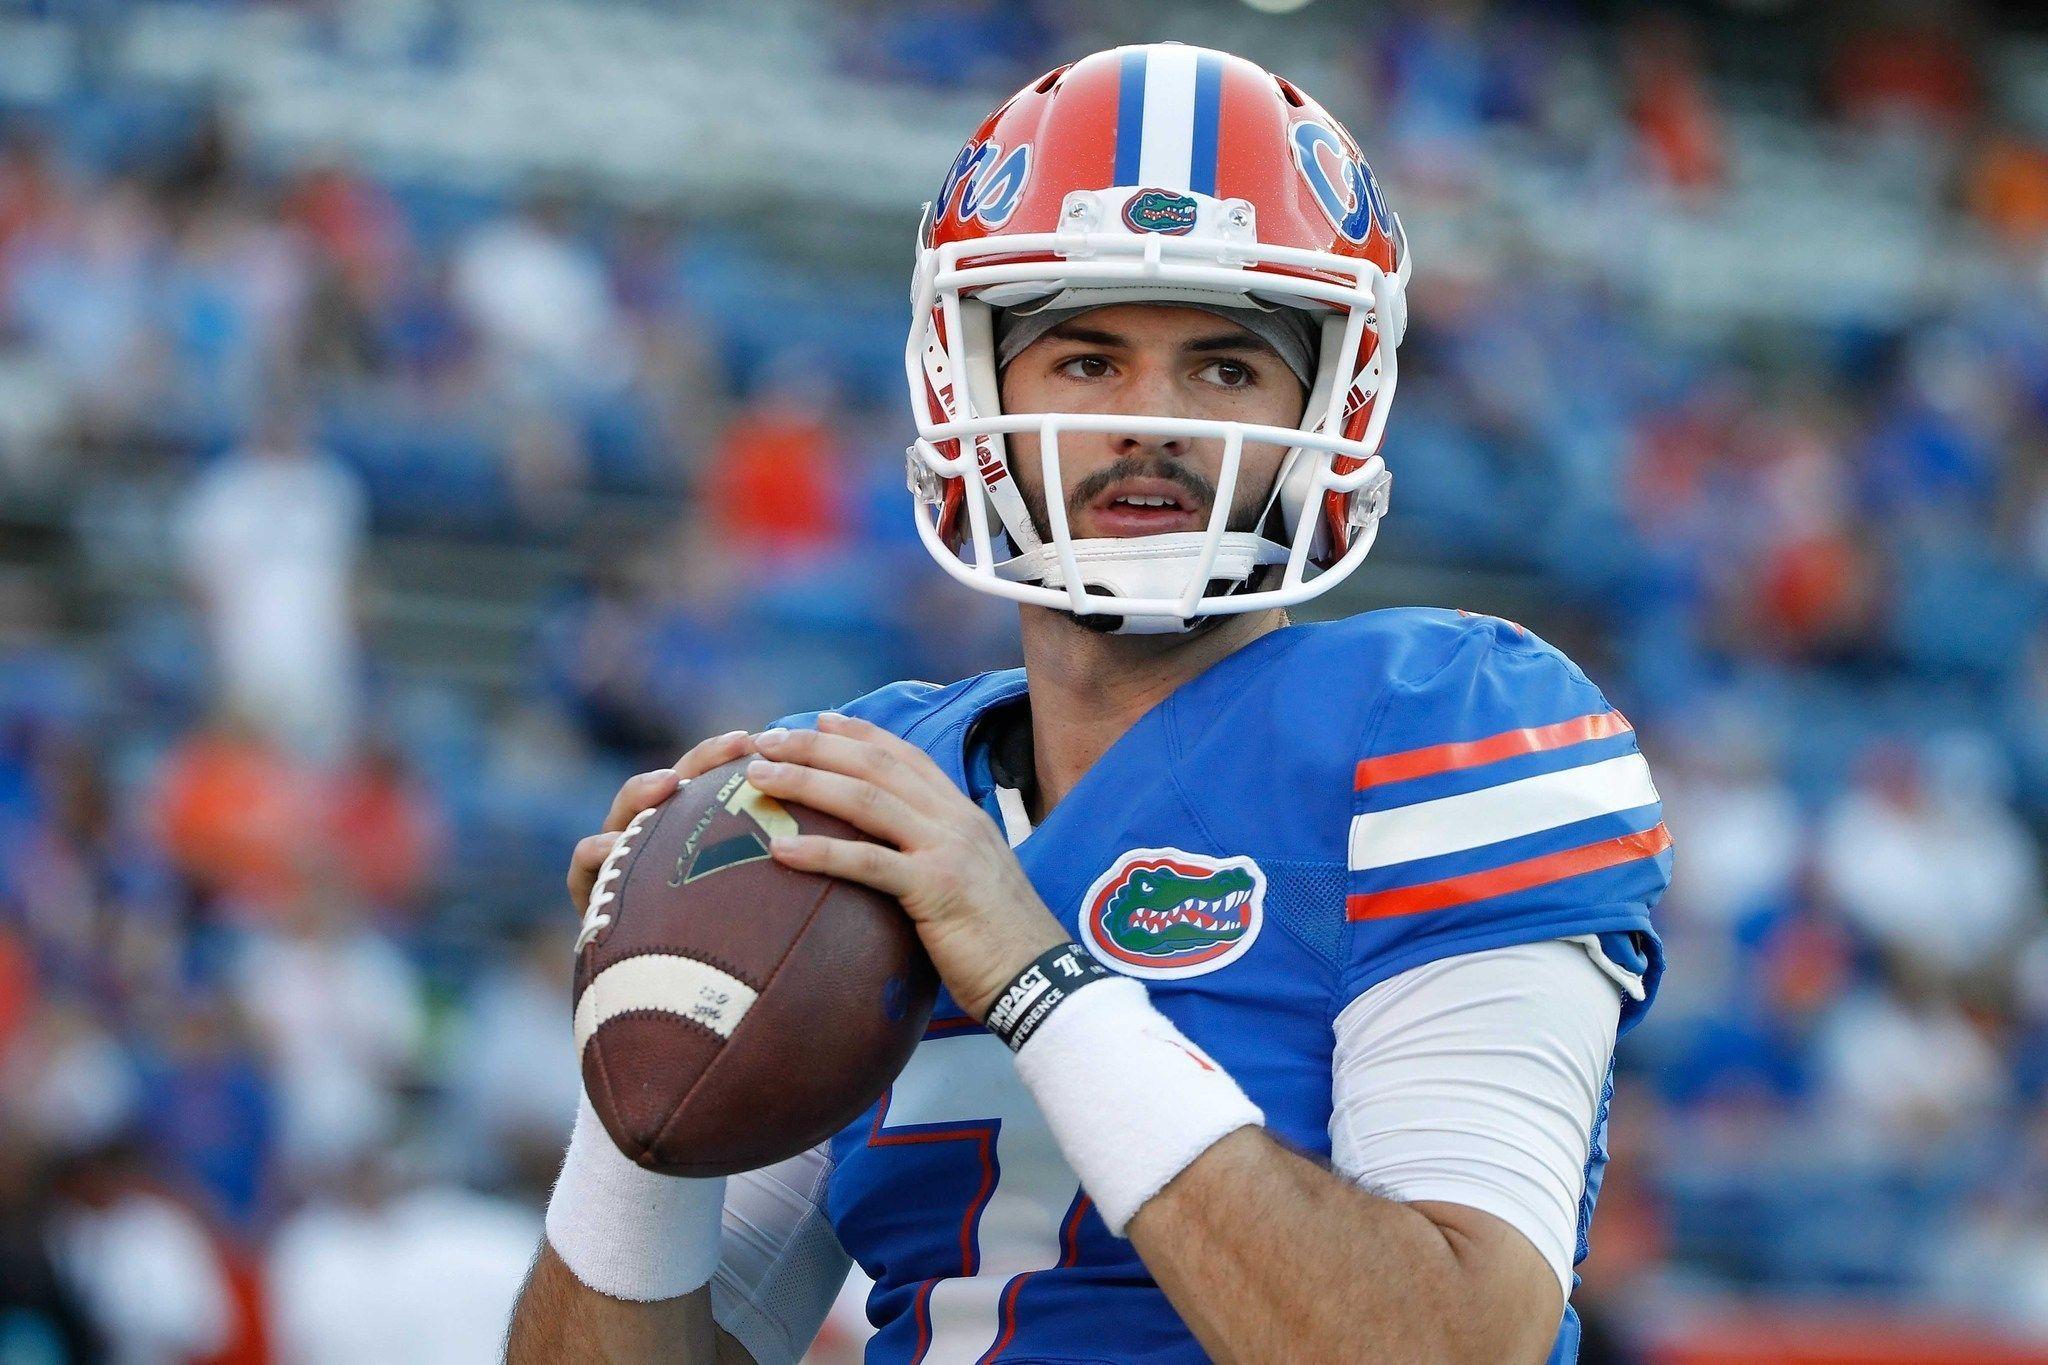 will grier, florida quarterback Will grier, Florida